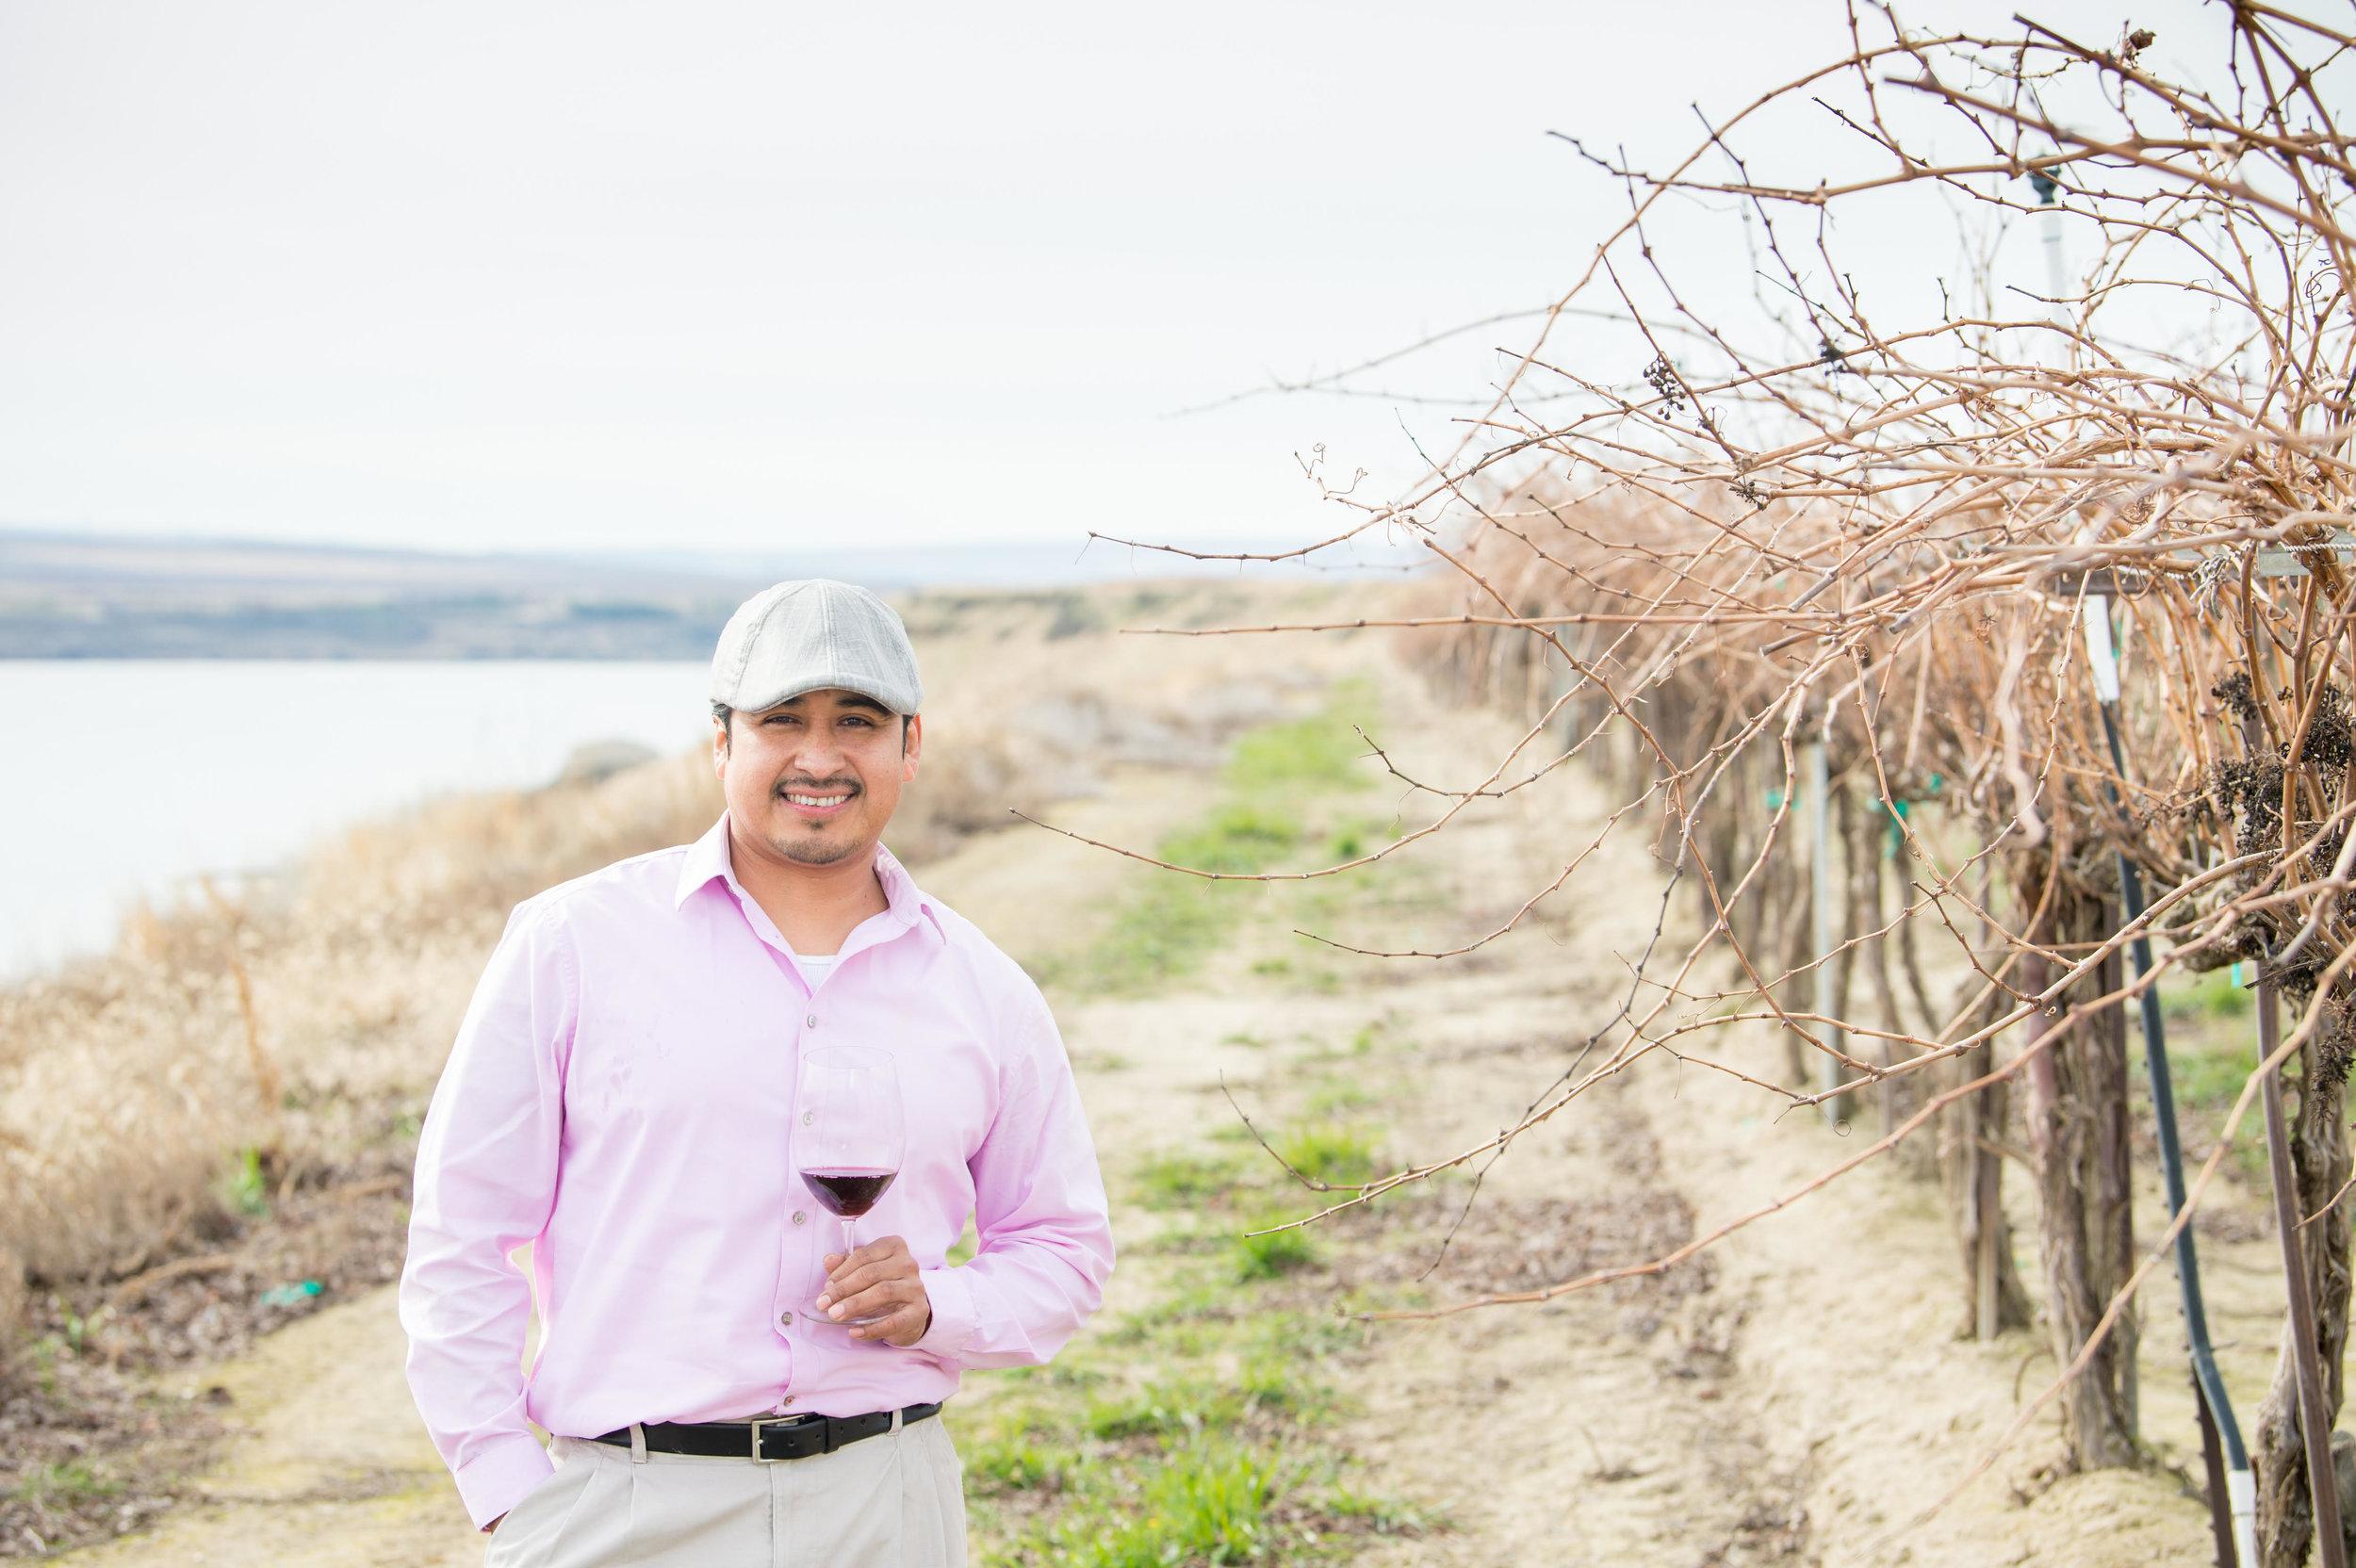 Fantastic photo of Victor de la Luz, the talented winemaker for Gordon Estate and De La Luz Wines.